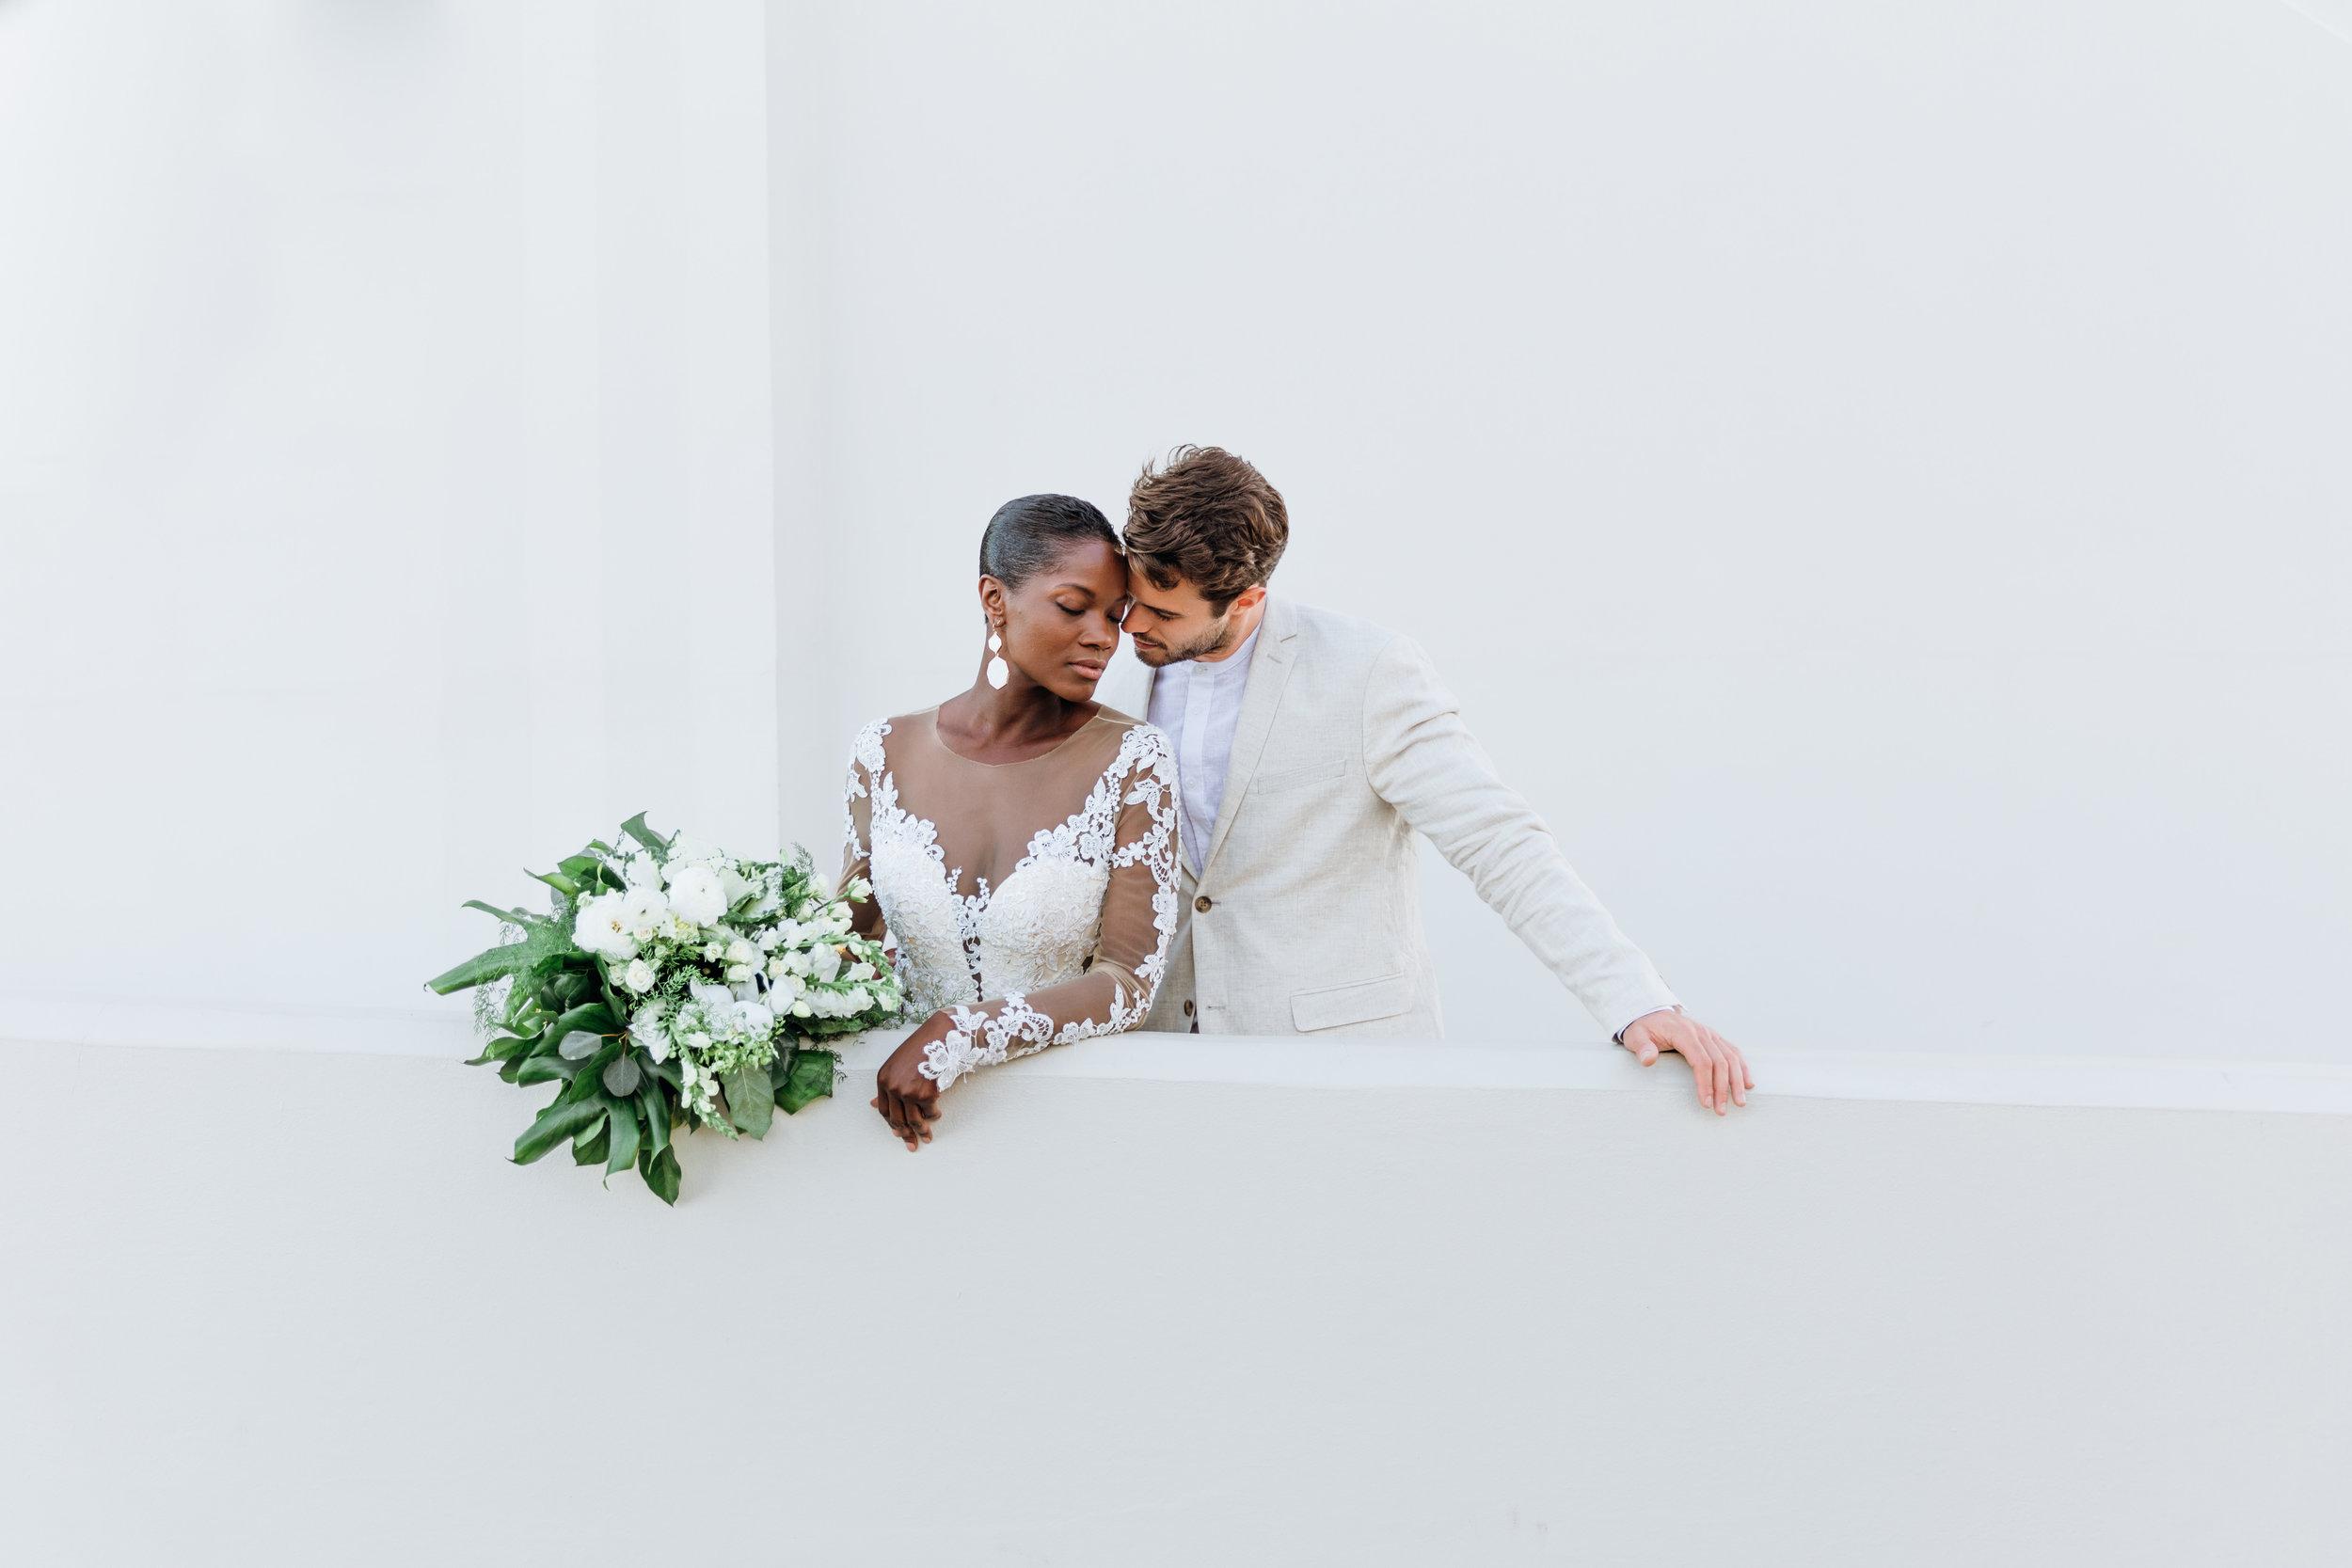 los-angeles-california-griffith-observatory-wedding-bridal-photography-michael-cozzens-35.jpg